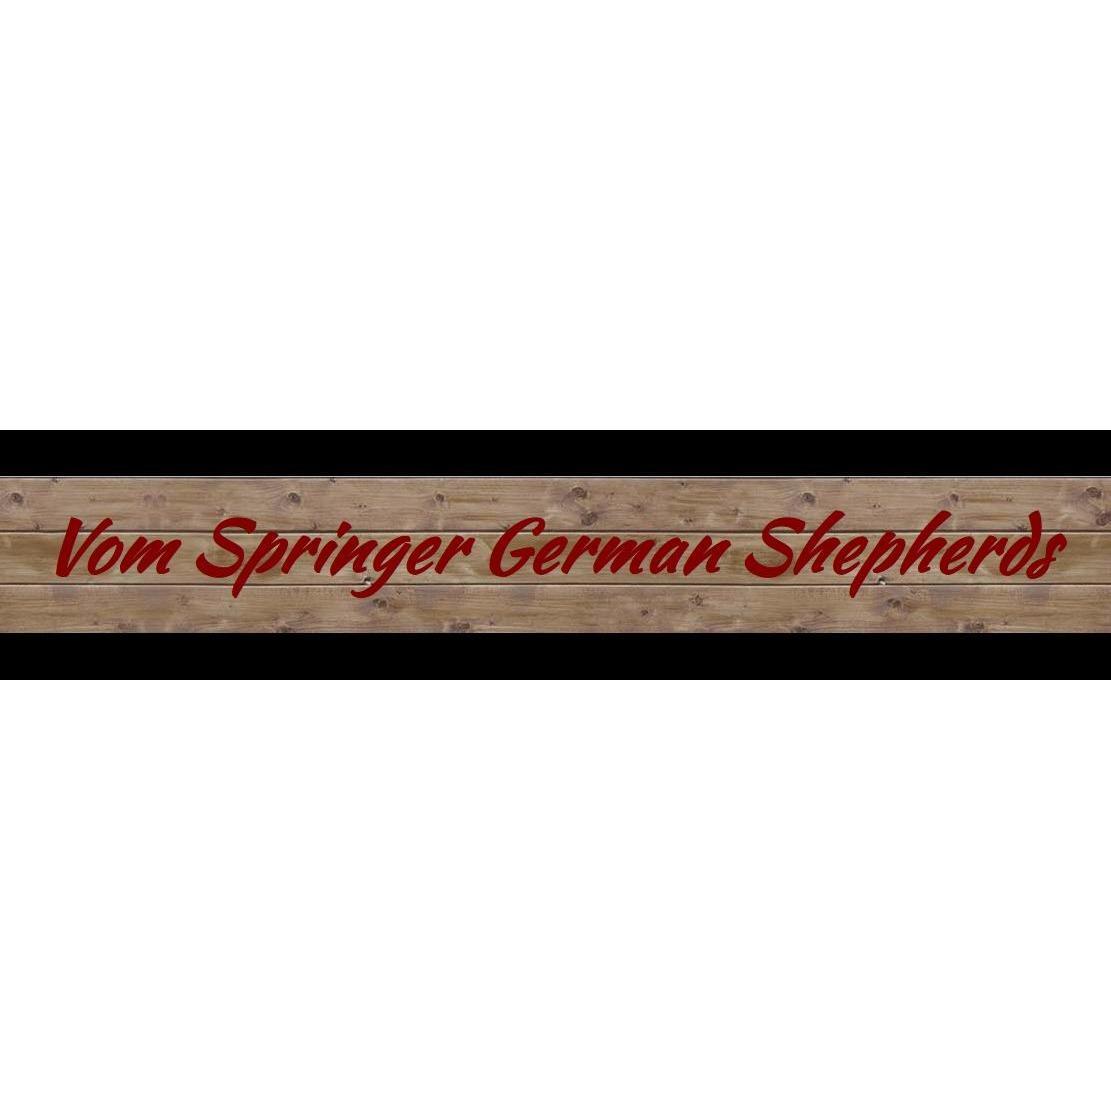 Vom Springer German Shepherds